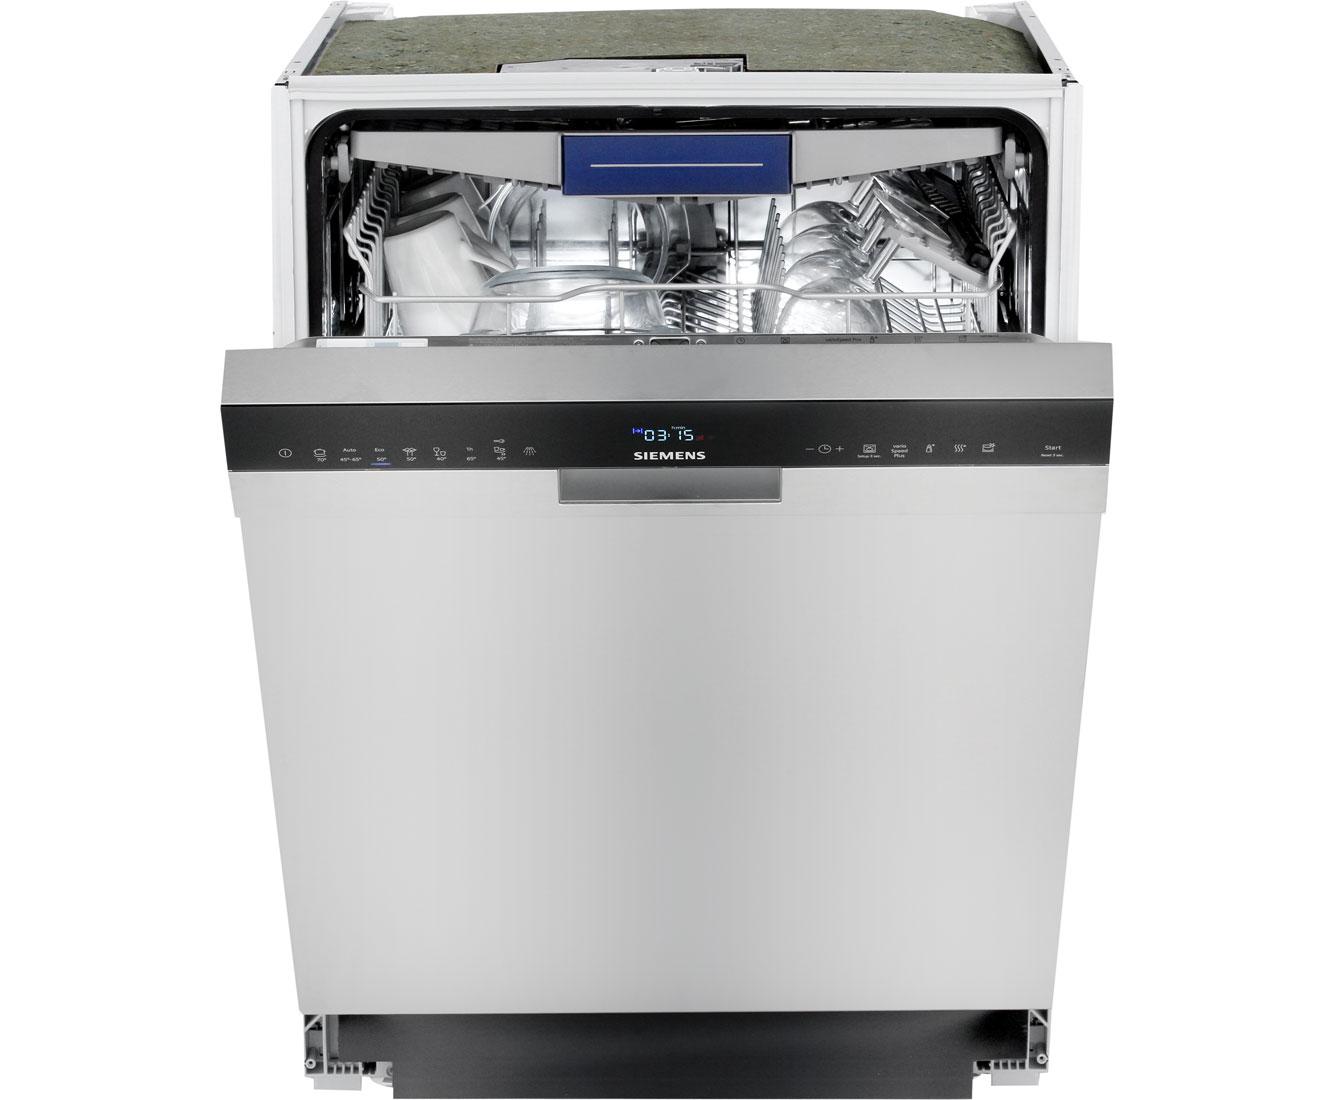 Siemens Iq500 Sn458s02me Unterbau Geschirrspuler 60 Cm Edelstahl A